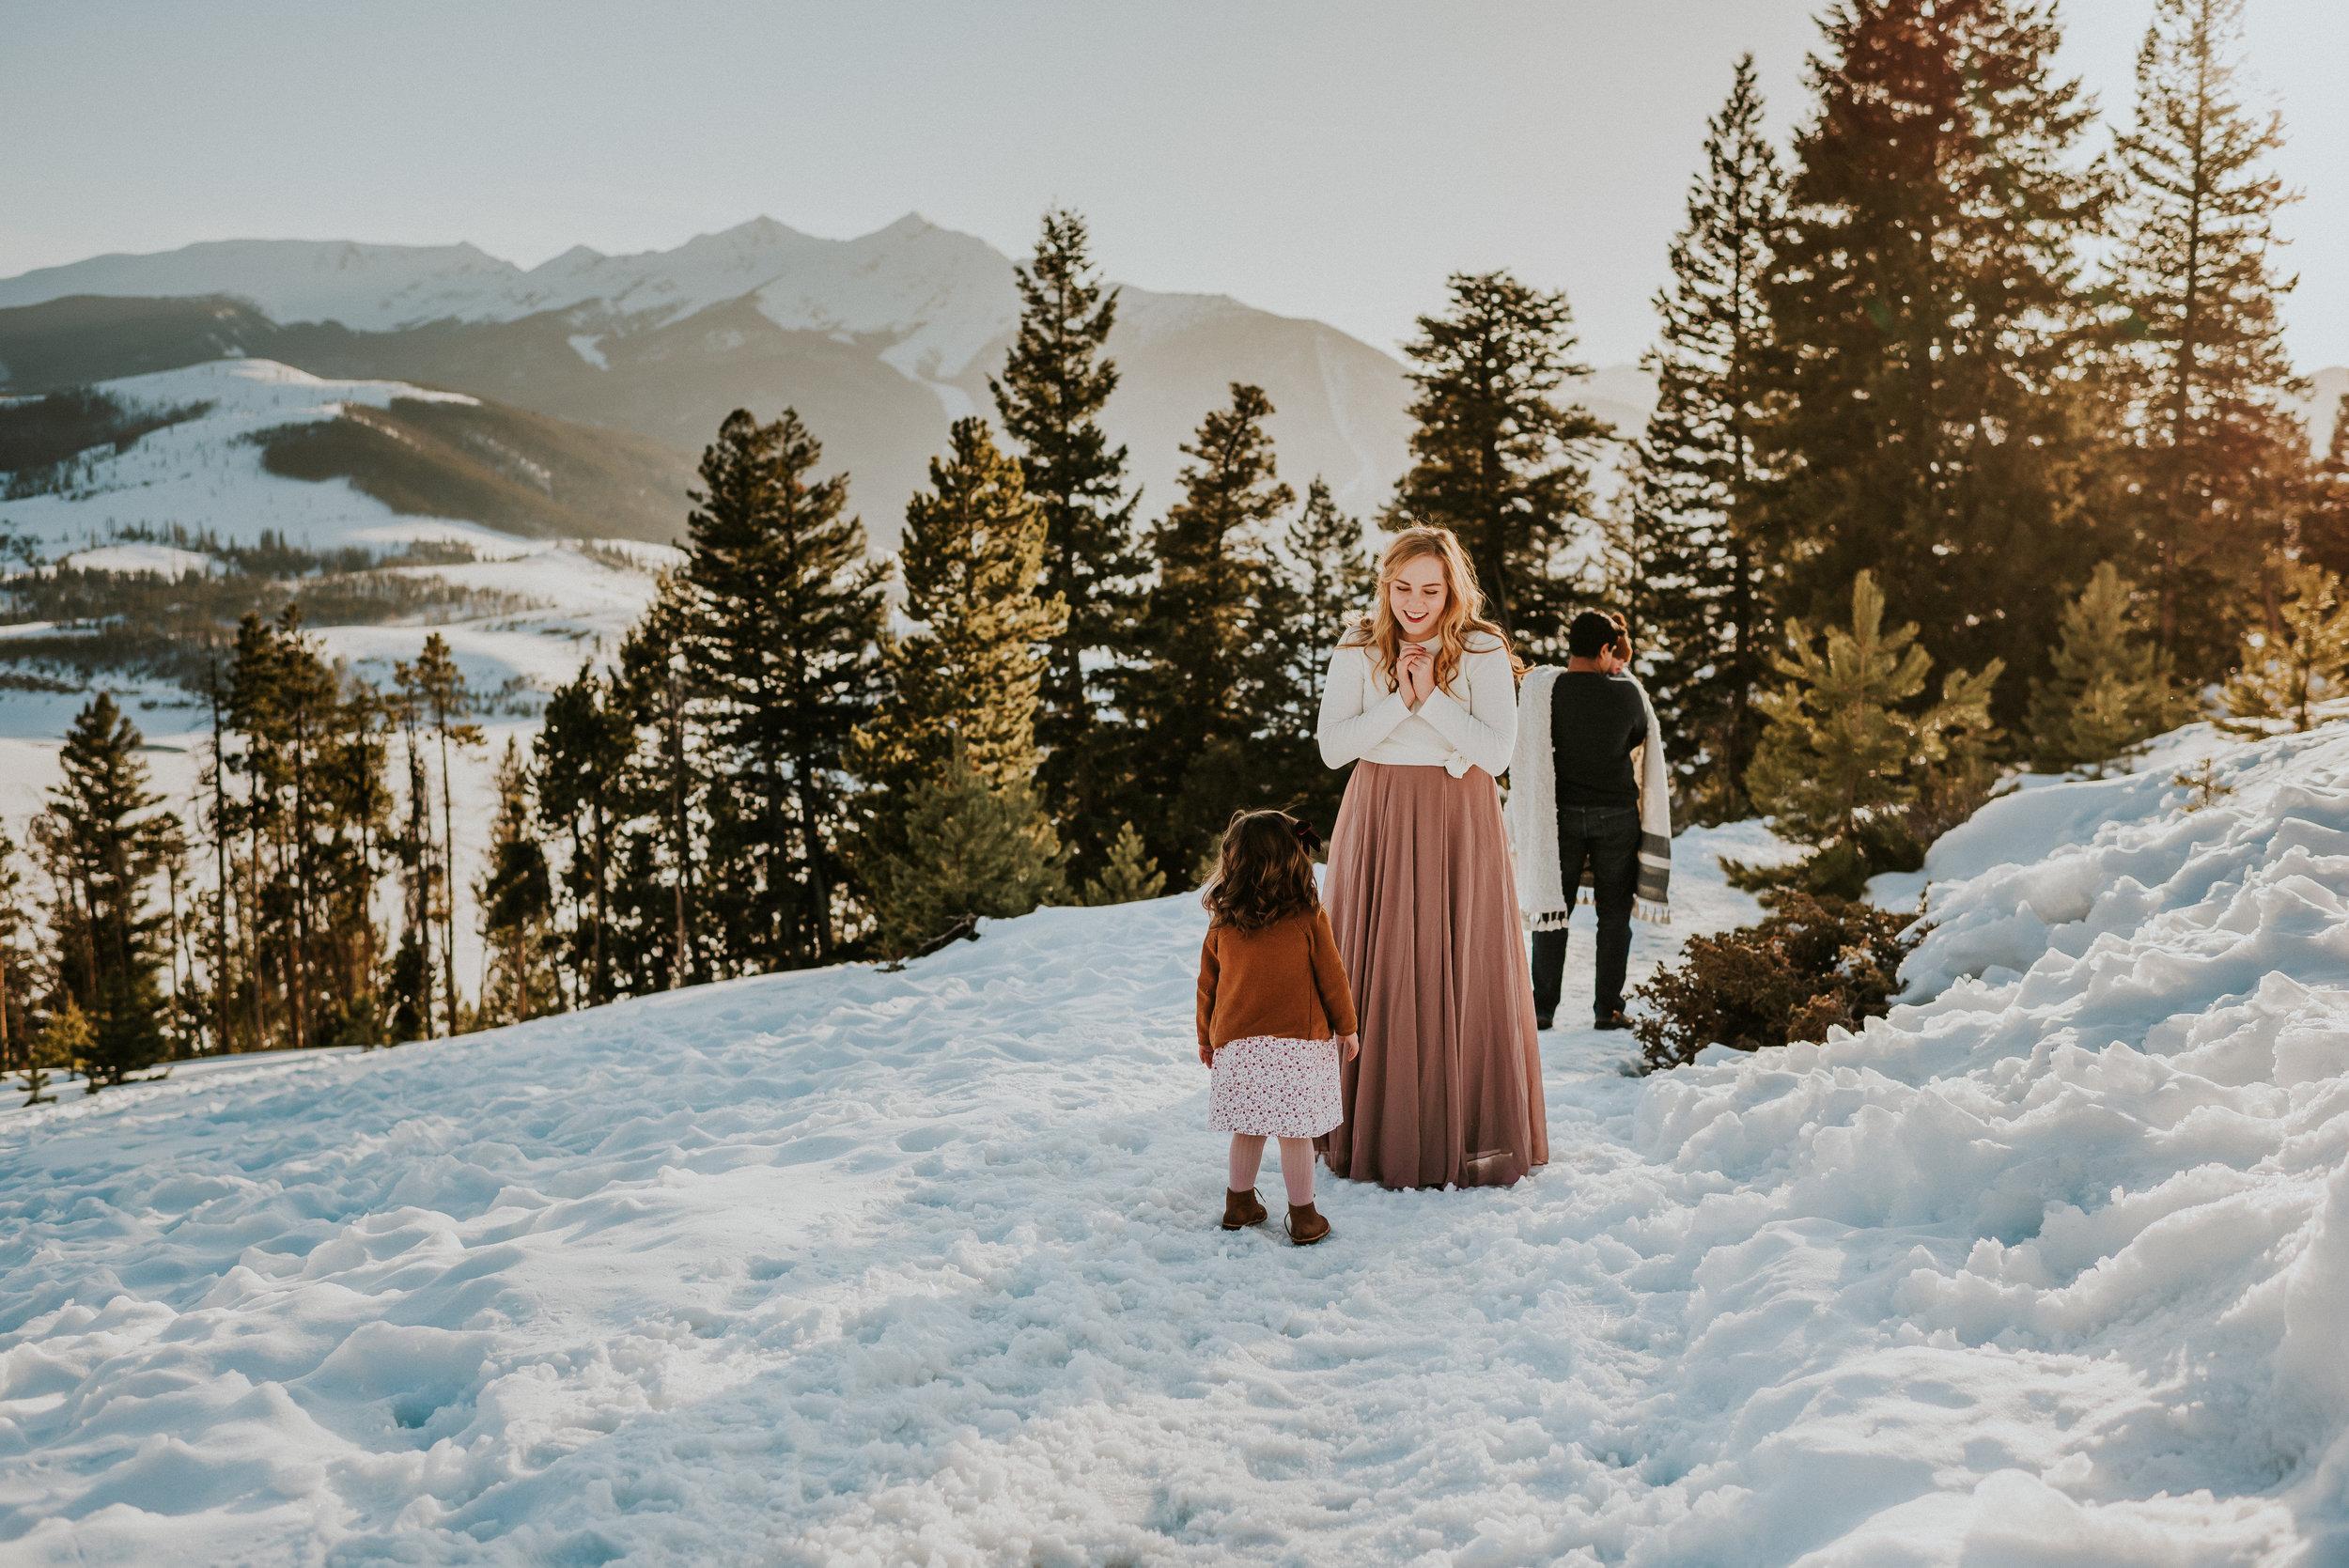 Jhawer_StoriedPhotography_2019-41.jpg